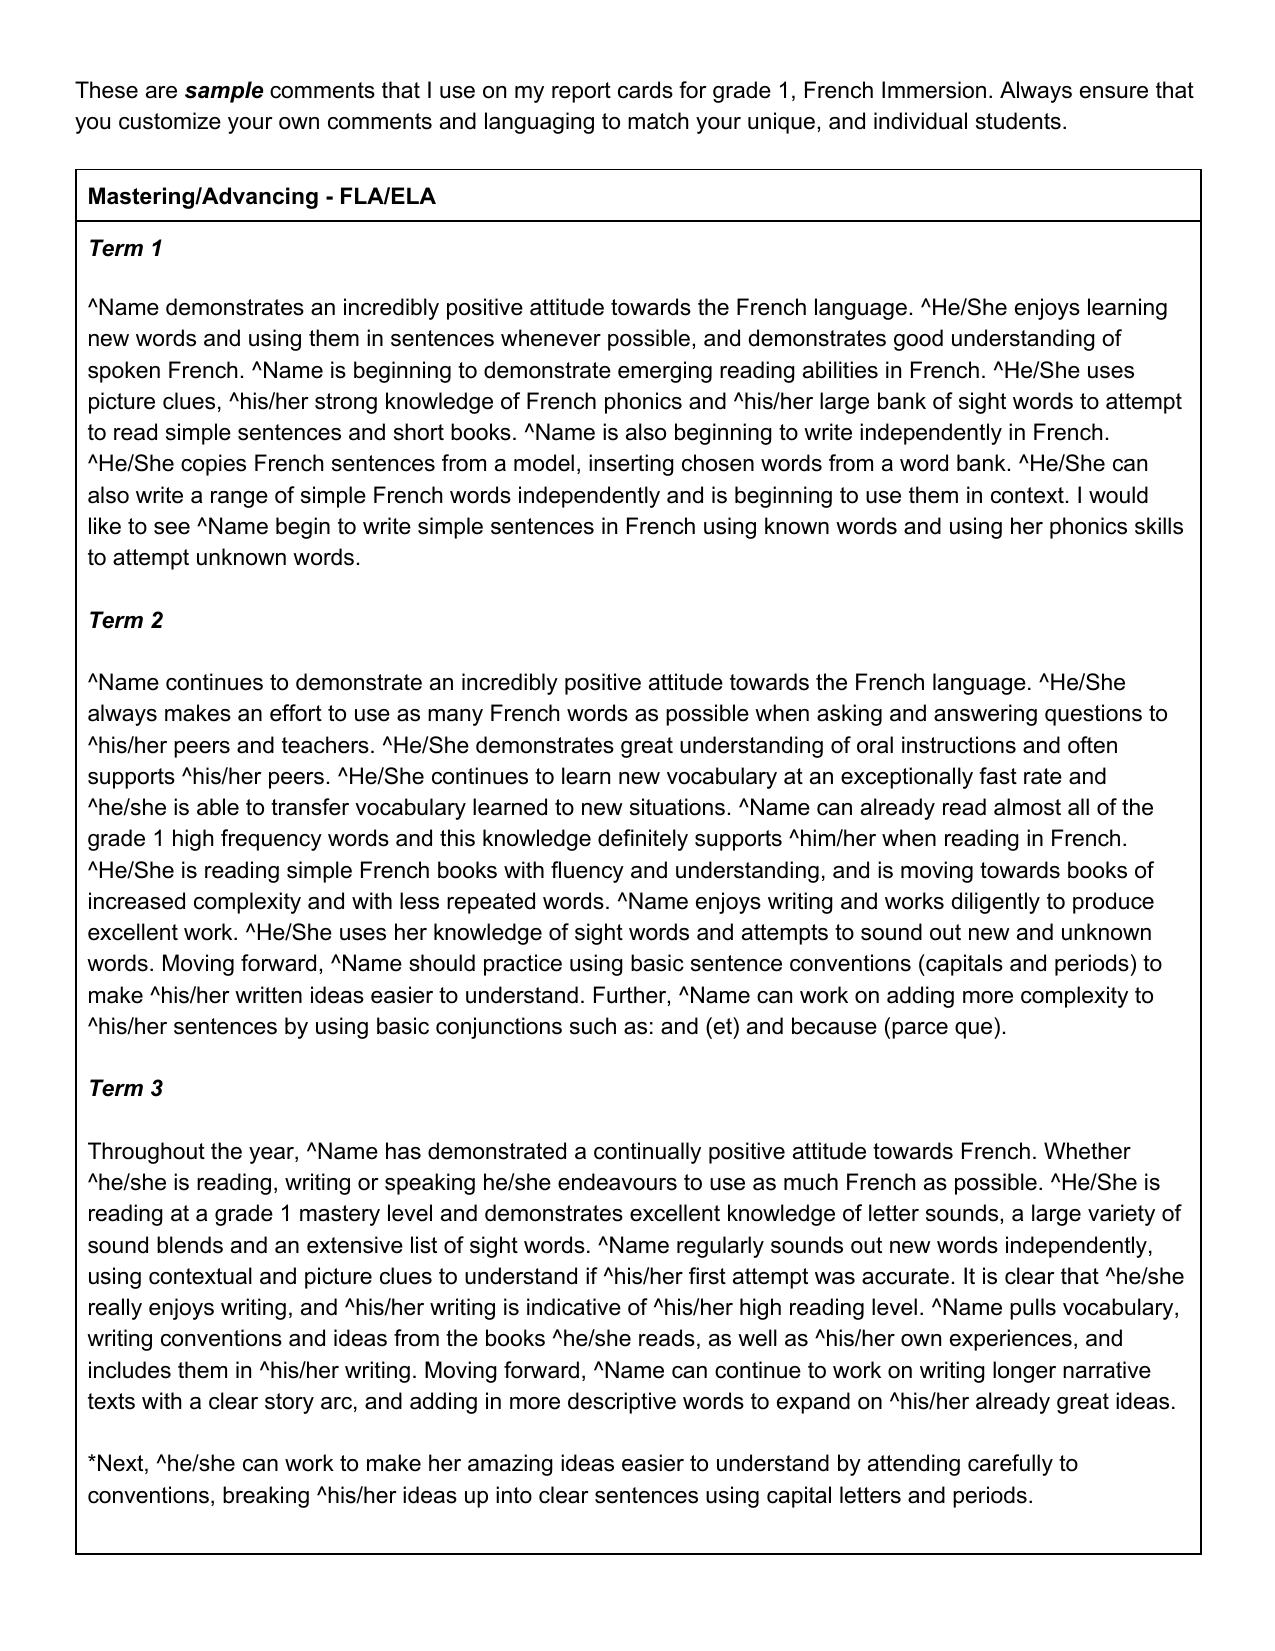 Pin By Noelia Labeau On Colegio Report Card Comments Kindergarten Report Card Comments Report Card School Report Card